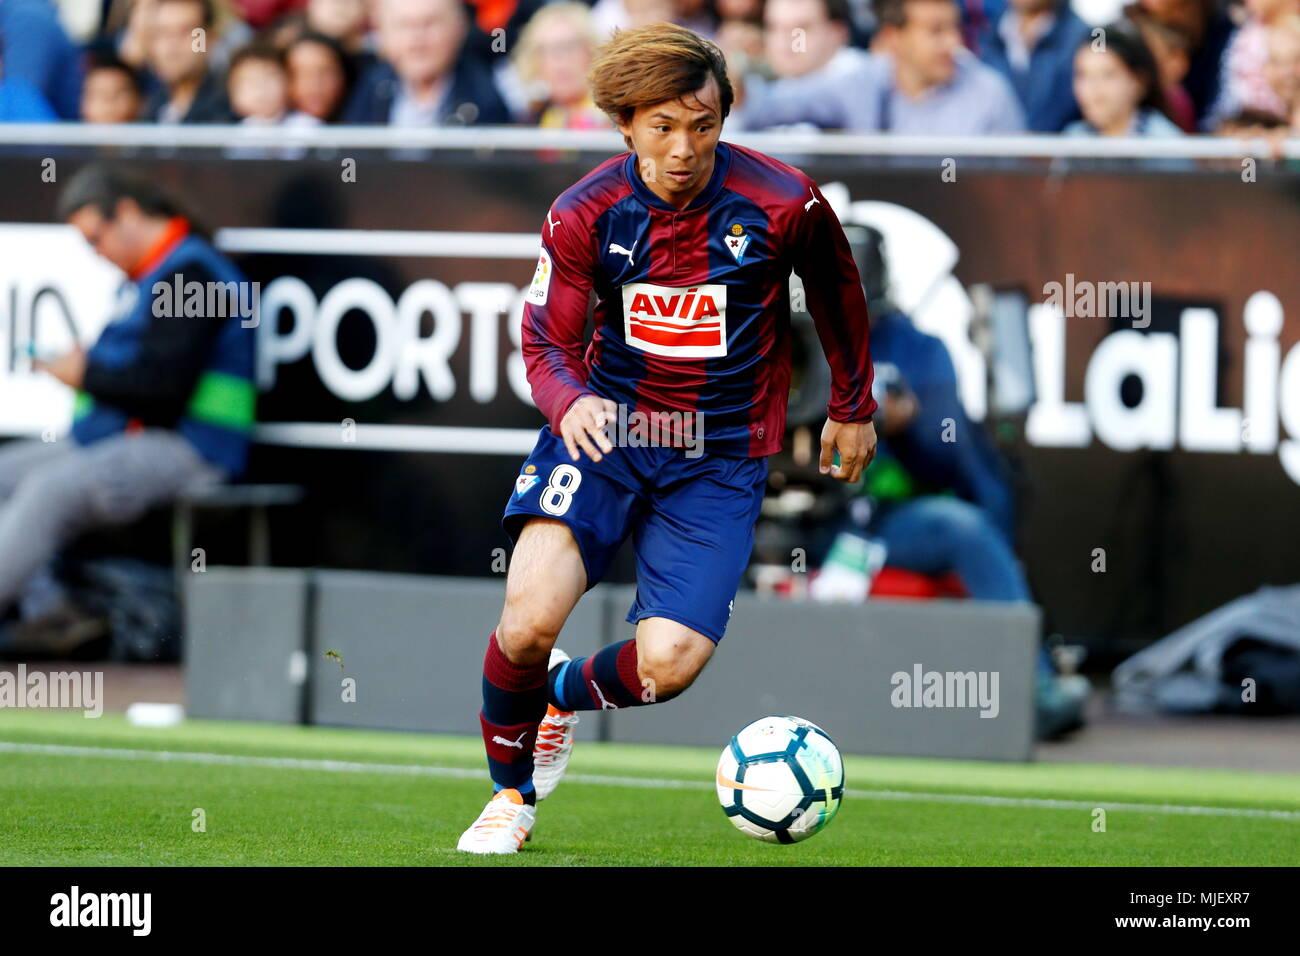 Takashi Inui (Eibar), APRIL 29, 2018 - Football / Soccer : Spanish 'La Liga Santander' match Valencia CF 0-0 SD Eibar at the Mestalla Stadium in Valencia, Spain. (Photo by Mutsu Kawamori/AFLO) [3604] - Stock Image